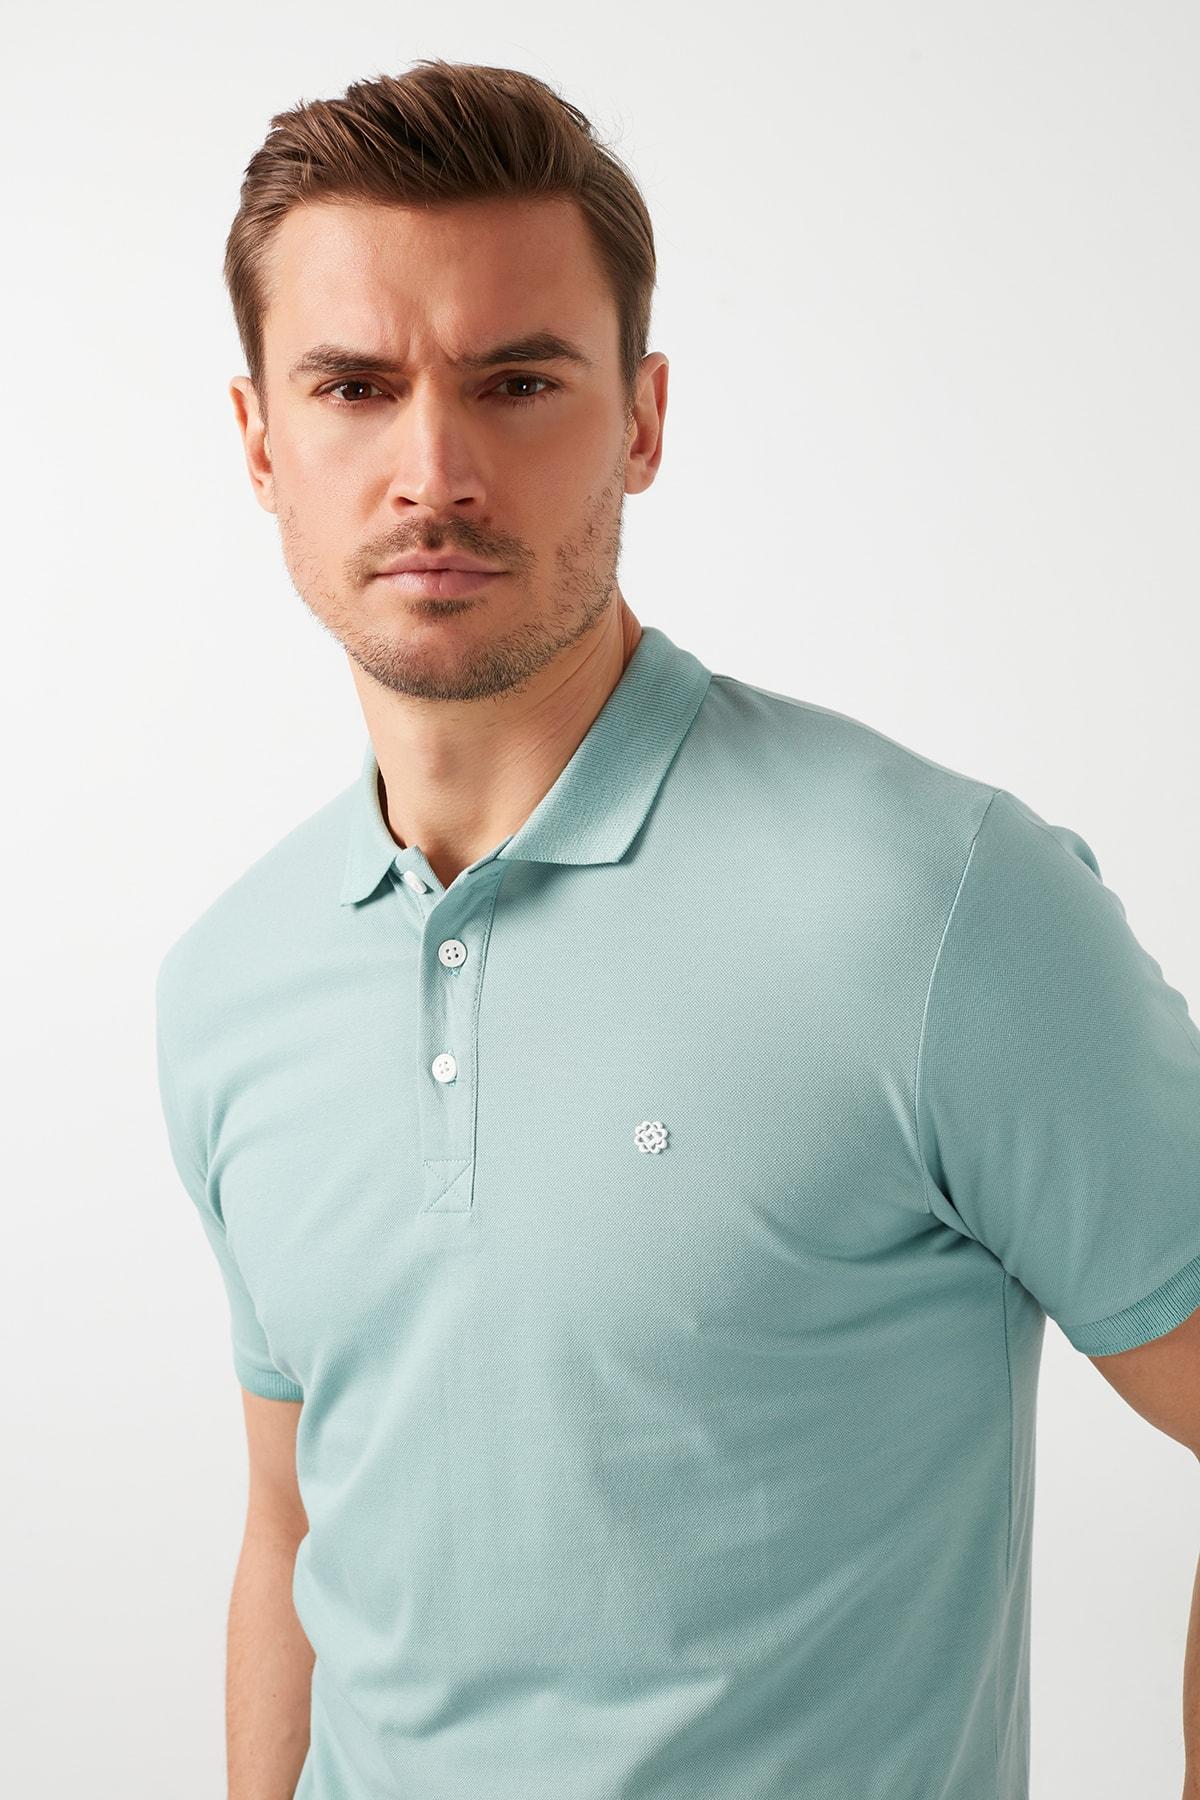 Buratti Pamuklu Düğmeli Polo T Shirt 0438101 0